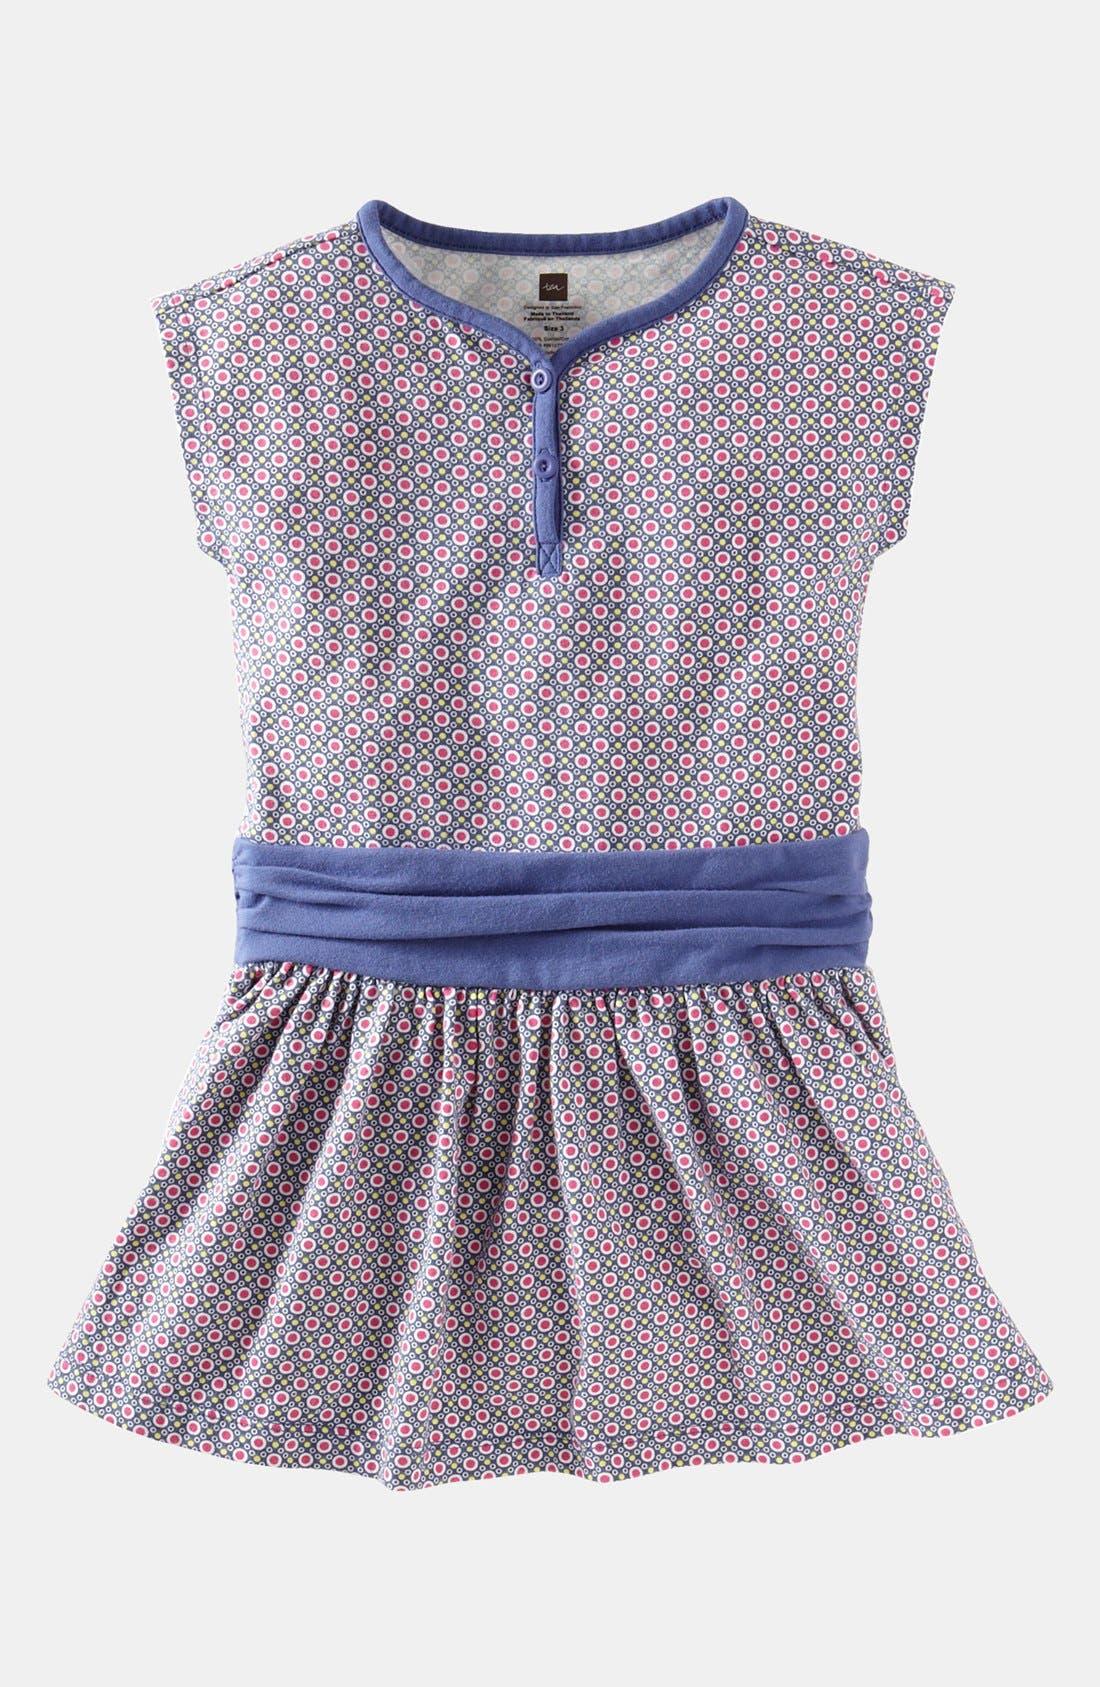 Main Image - Tea Collection 'Beijing Dot' Henley Dress (Toddler Girls)